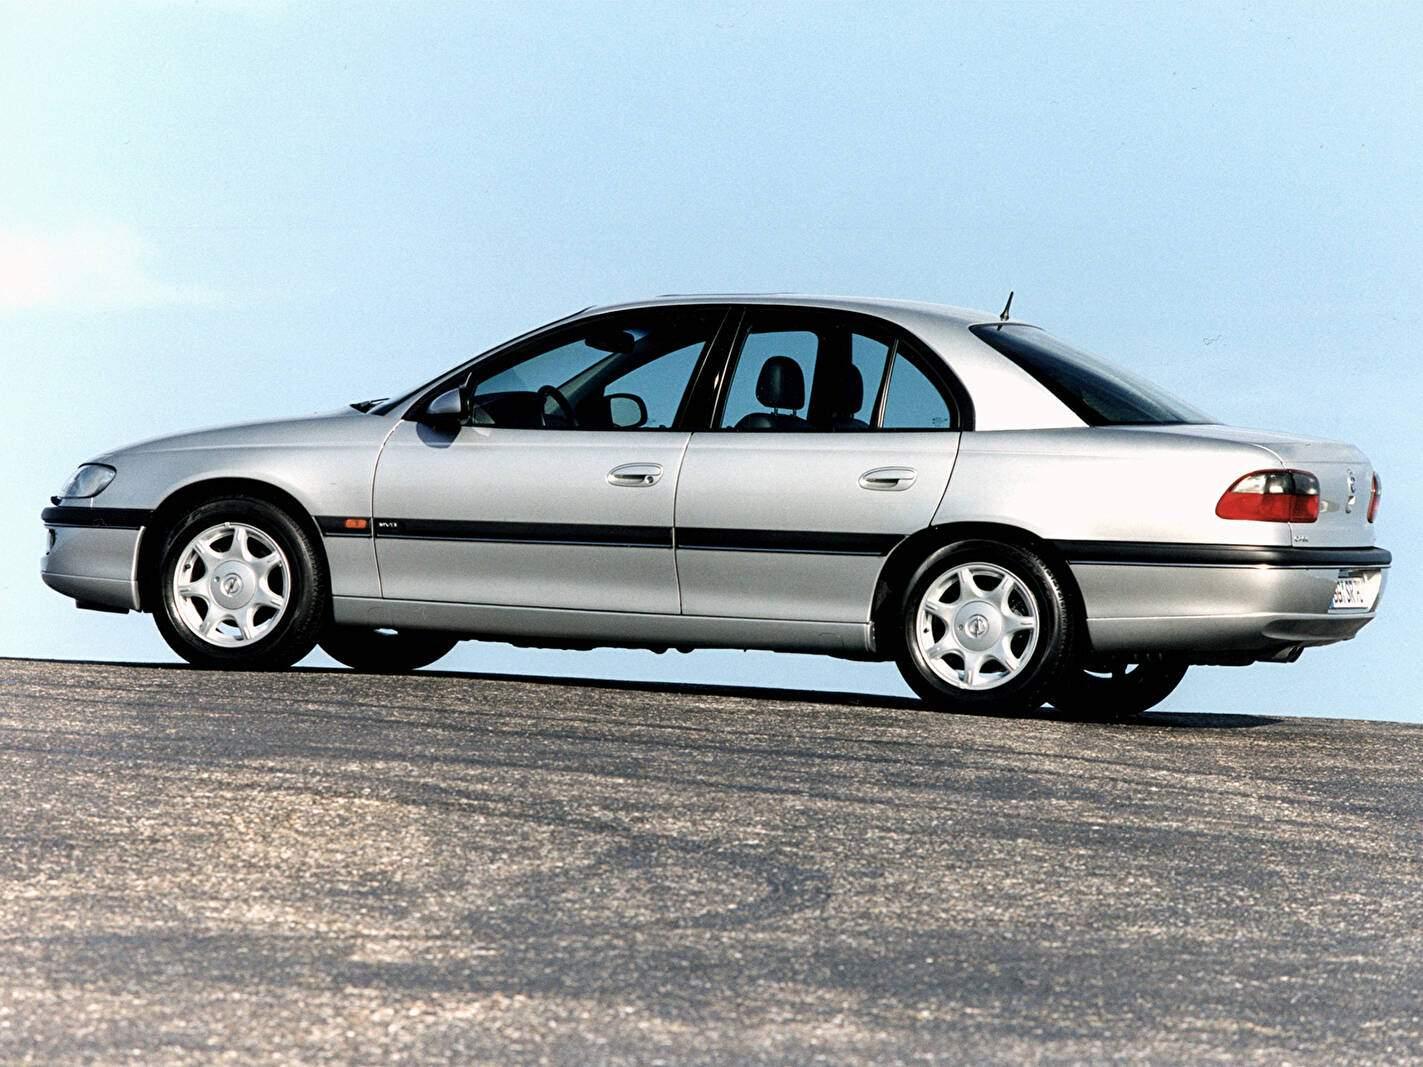 Opel Omega II 3.0 V6 (B) (1994-2000),  ajouté par fox58